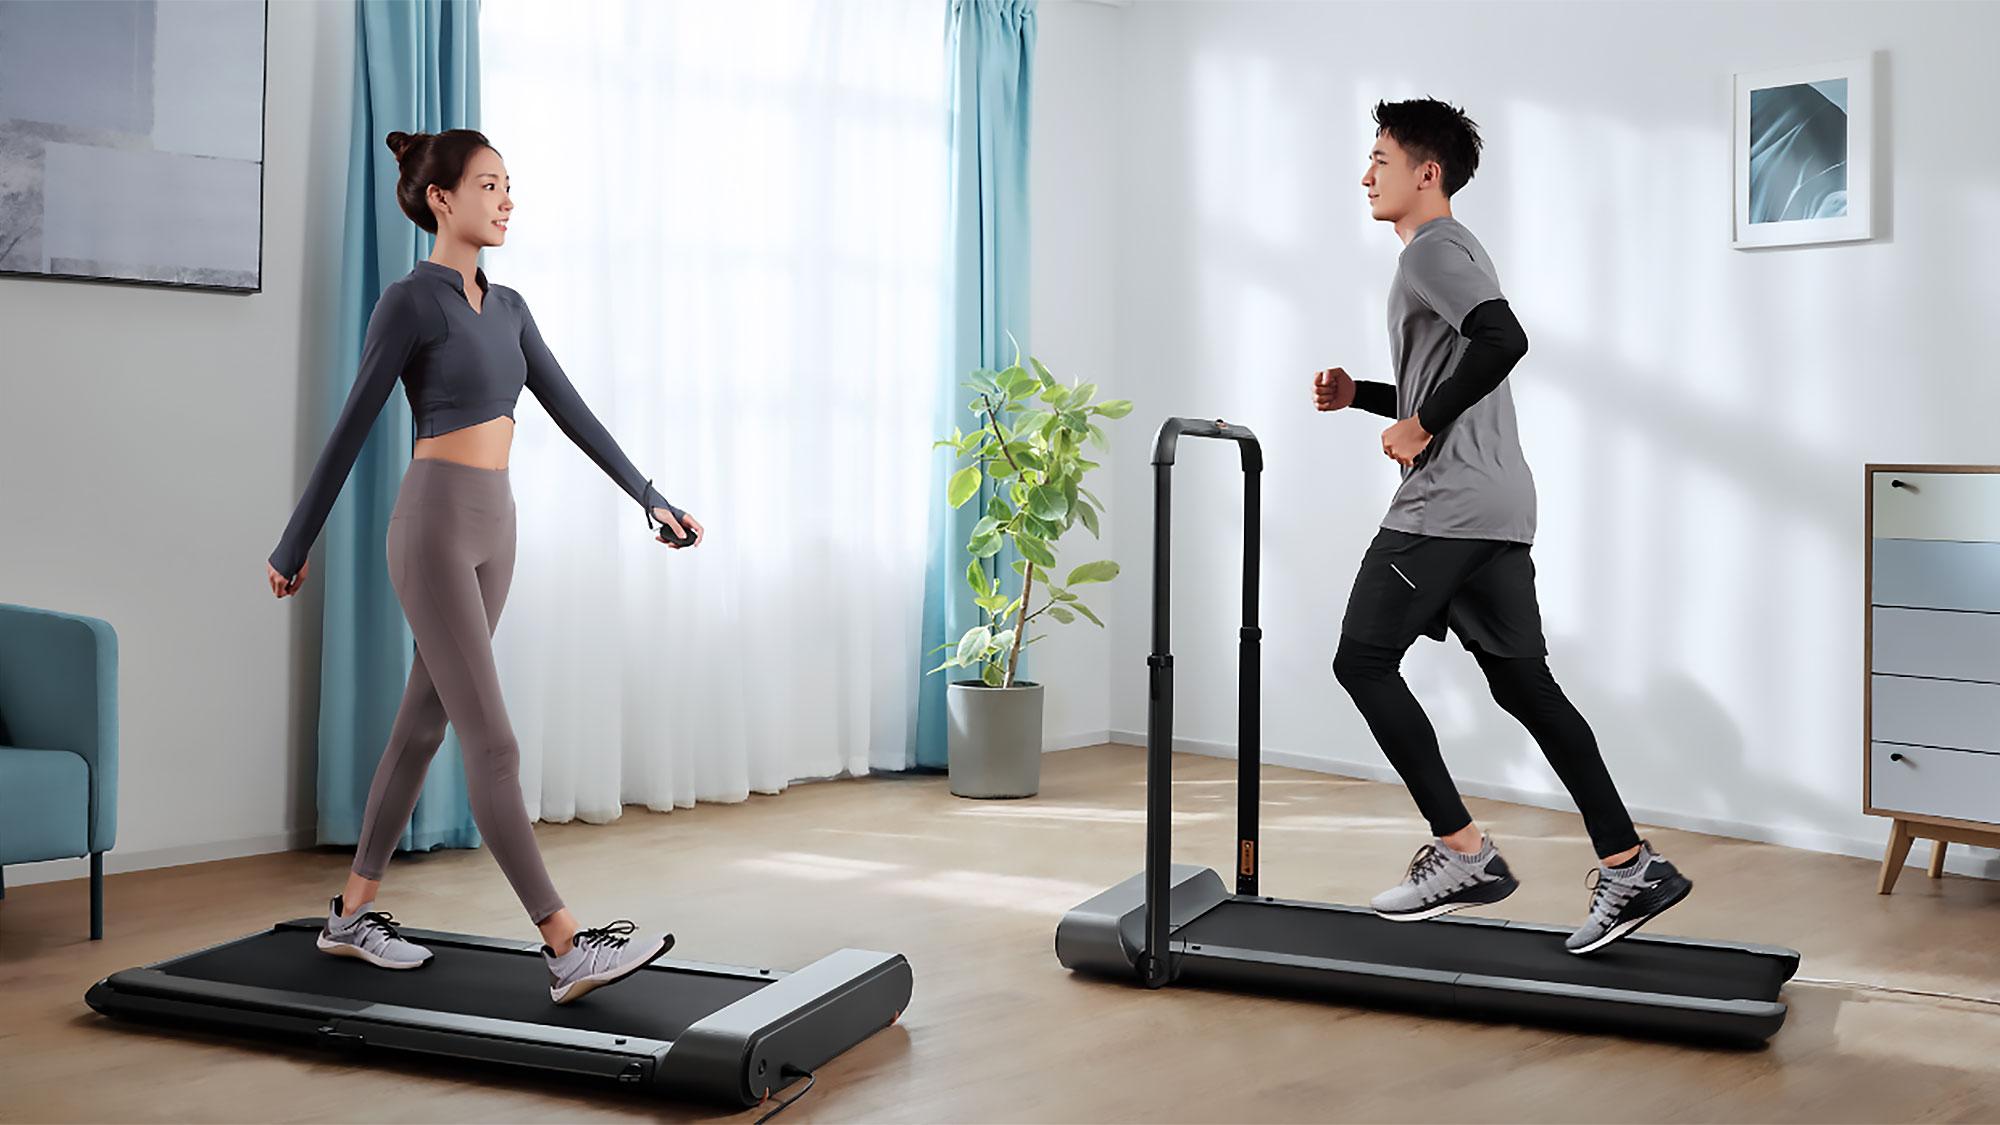 Xiaomi WalkingPad R1 Pro Treadmill Featured image